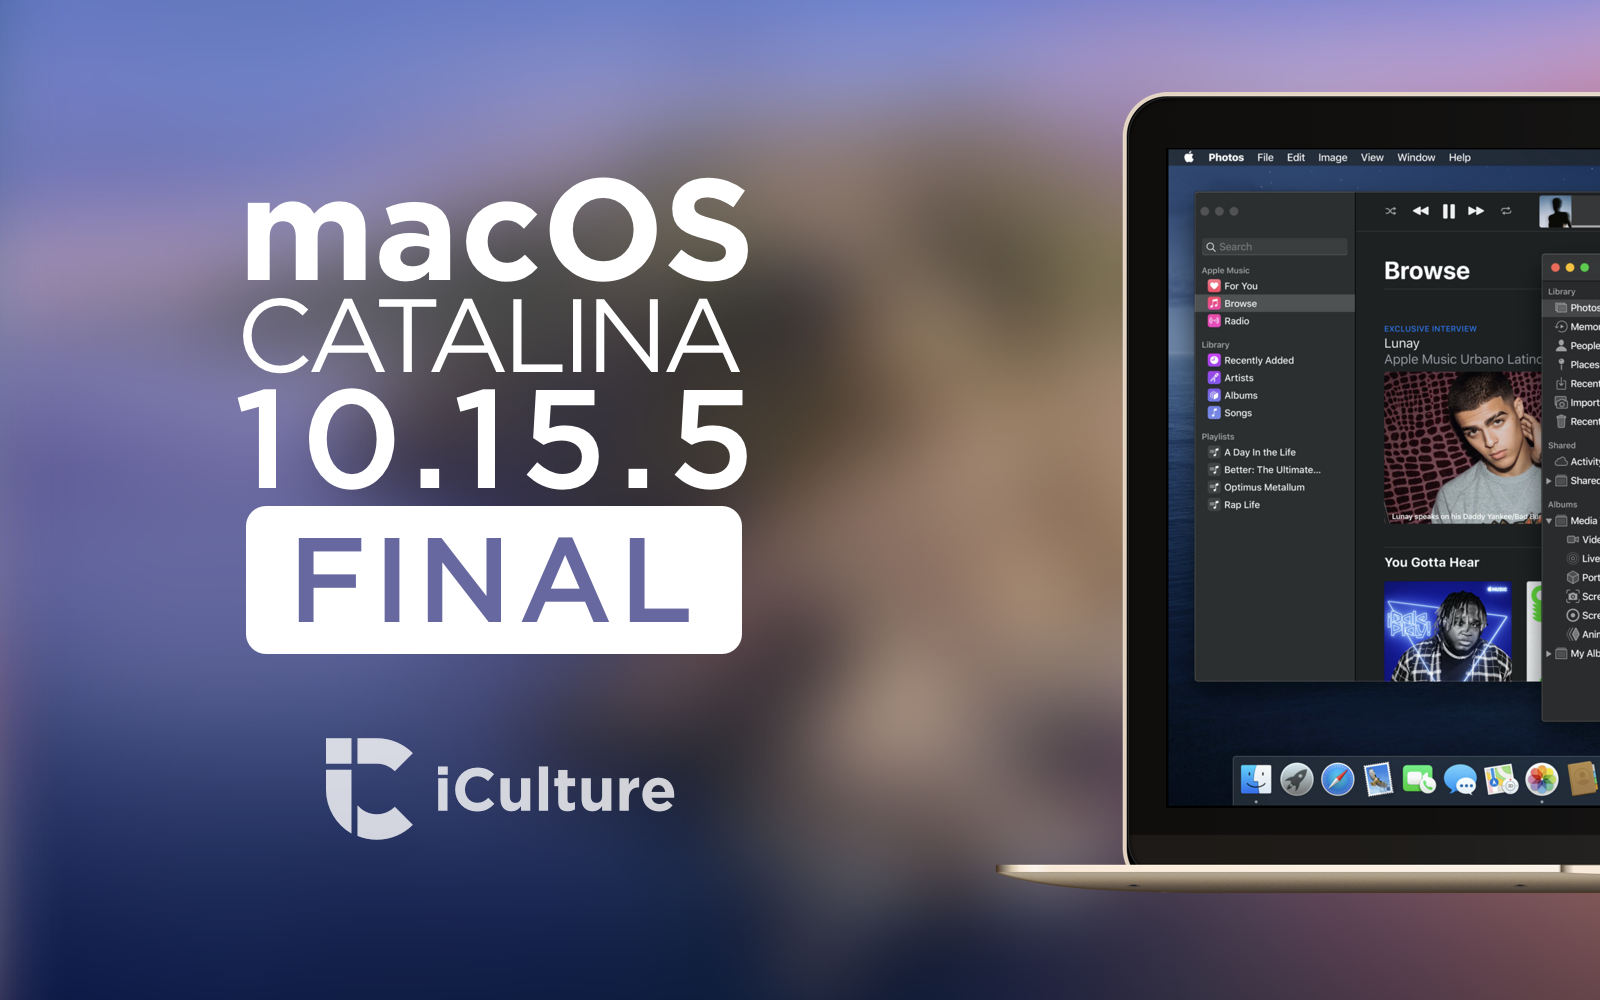 macOS Catalina 10.15.5 final.